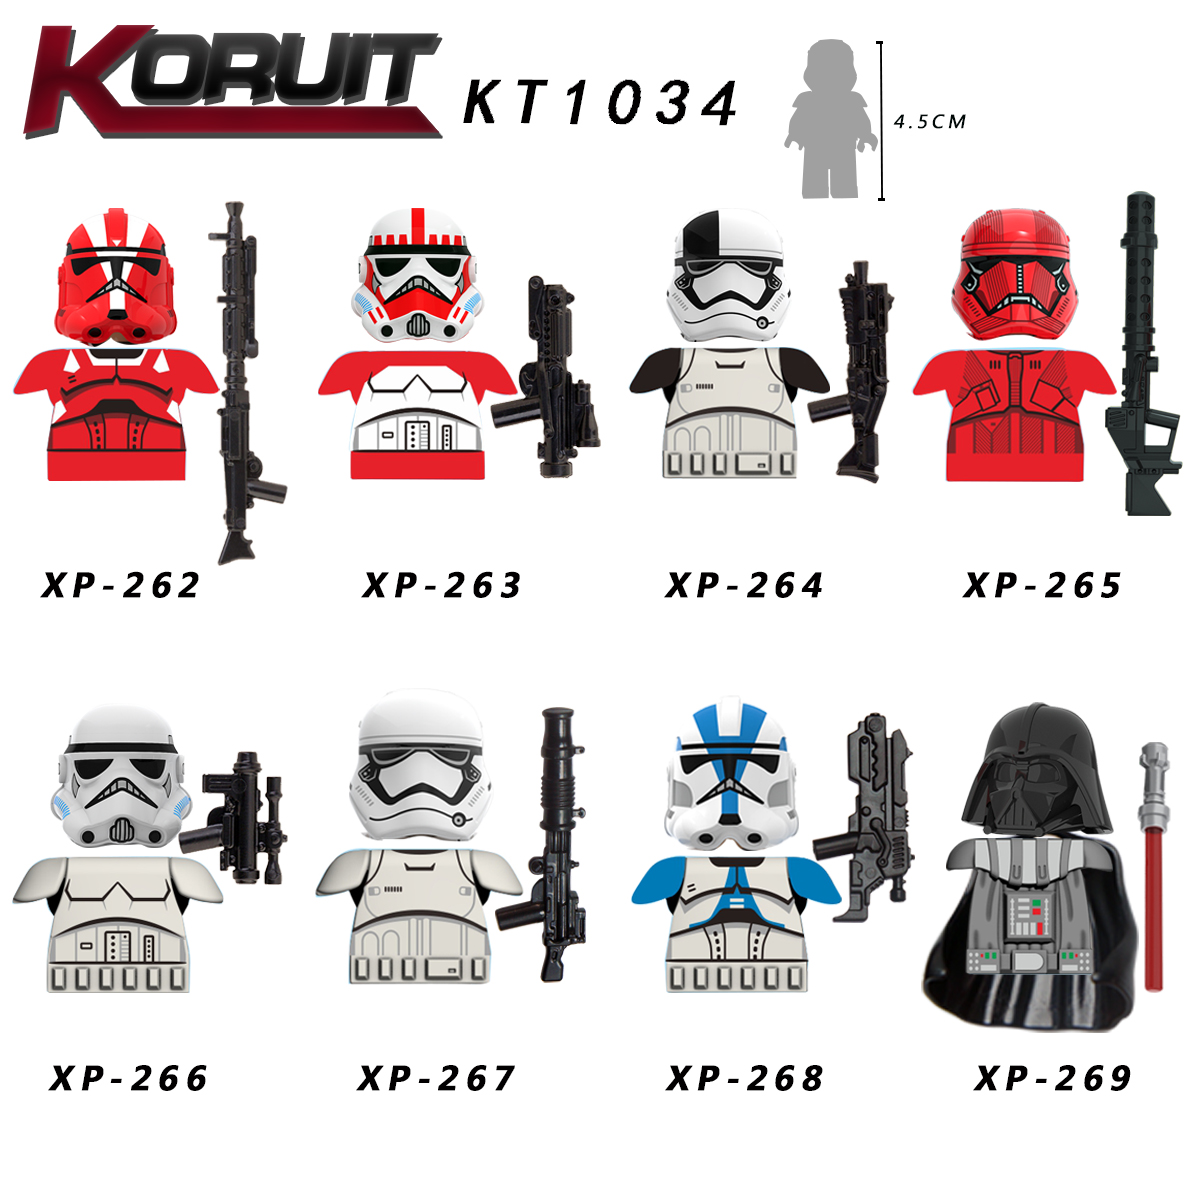 21pcs-new-font-b-starwars-b-font-figures-imperial-army-military-clone-trooper-shock-trooper-mini-building-blocks-figure-child-toy-gift-kt1034